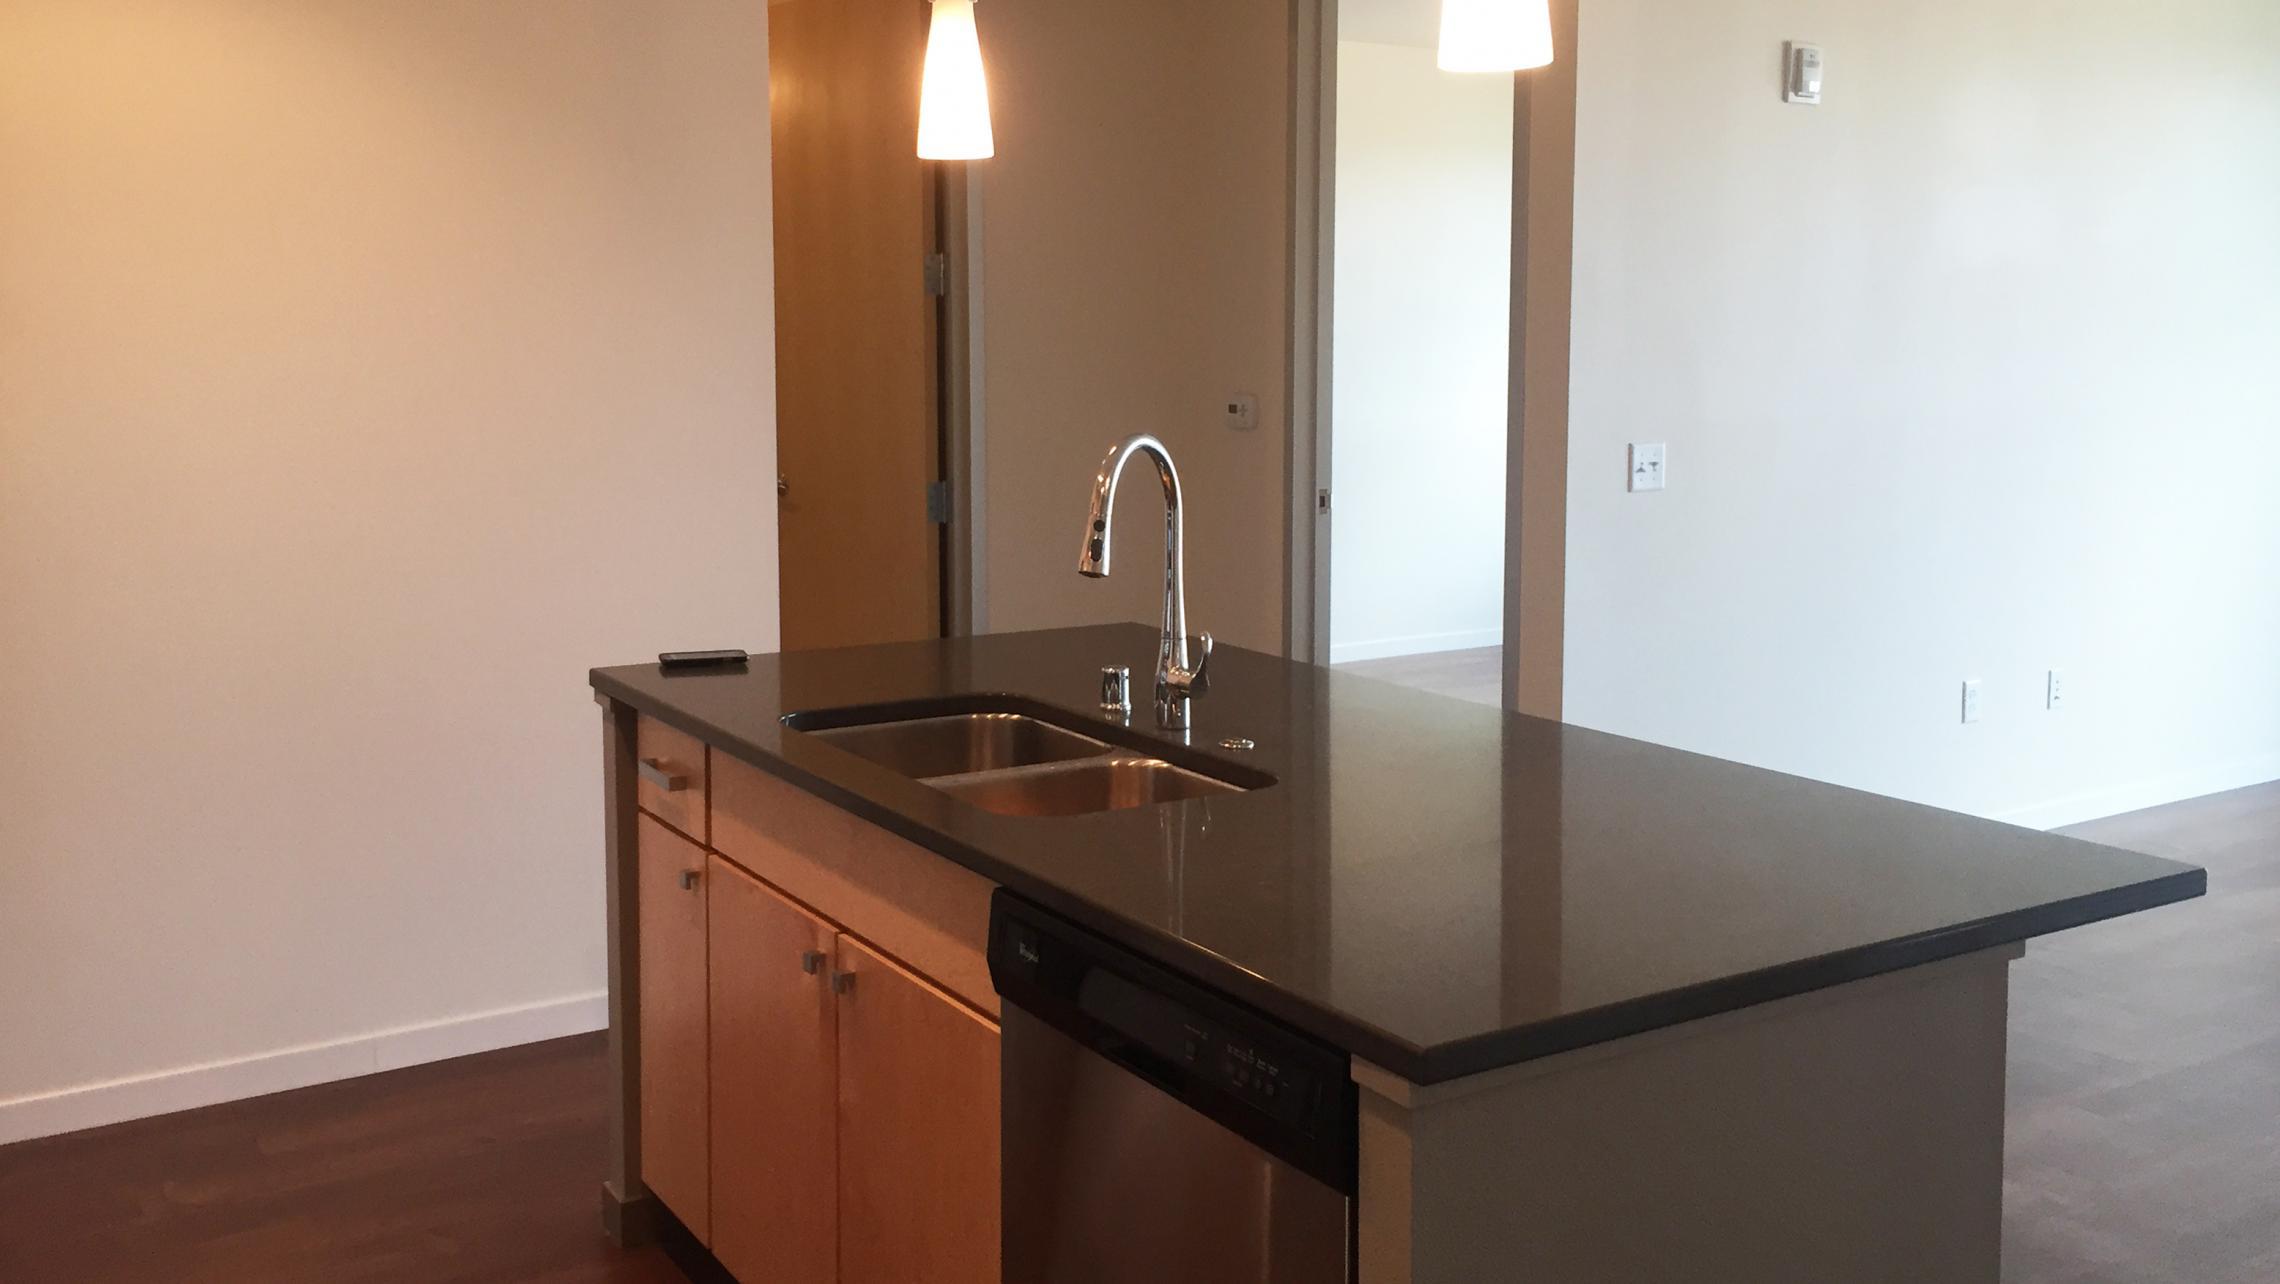 ULI Nine Line Apartment 422 - Kitchen Island